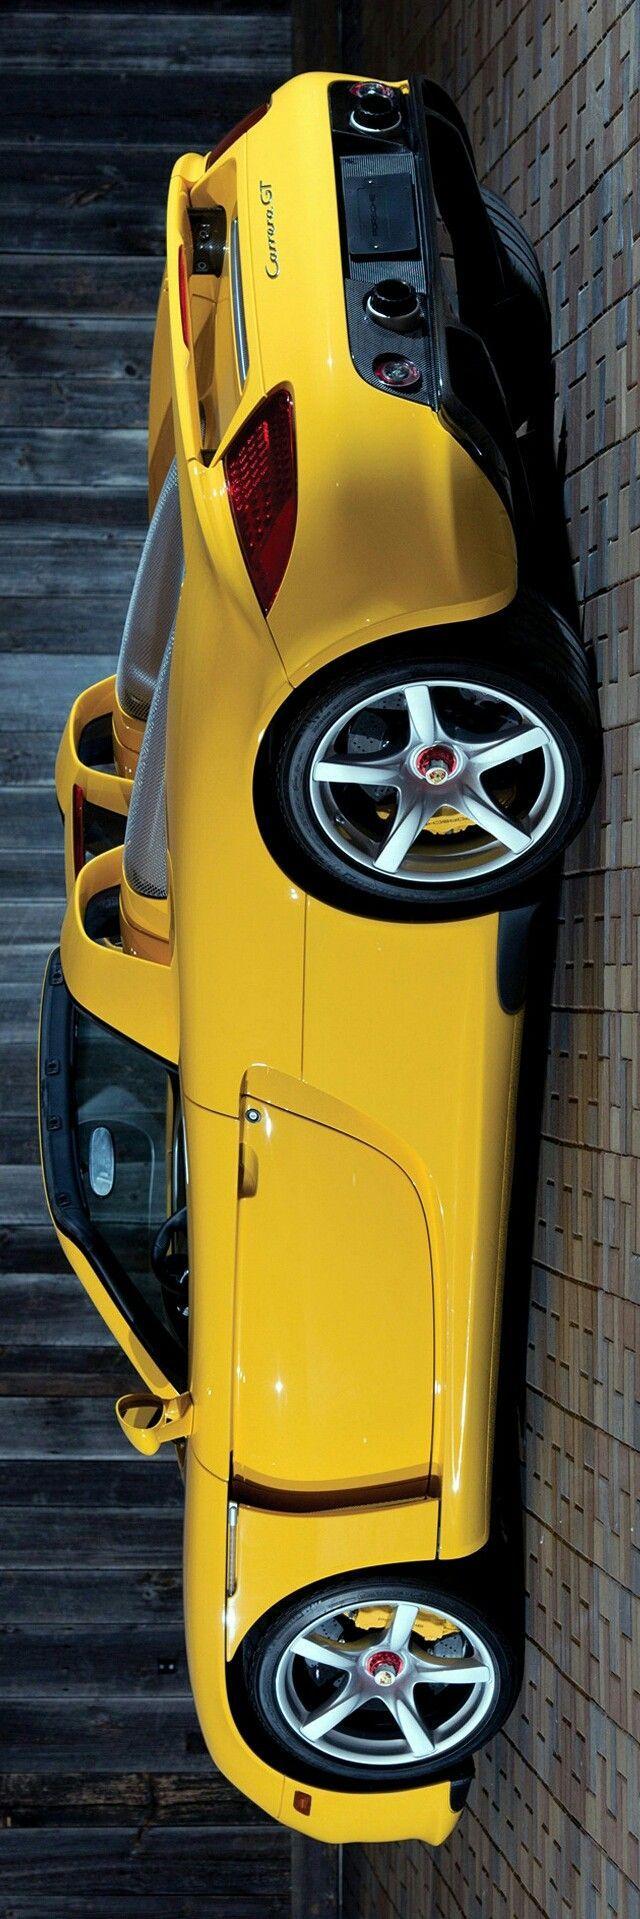 PORSCHE CARRERA GT by Levon                                                                                                                                                                                 More